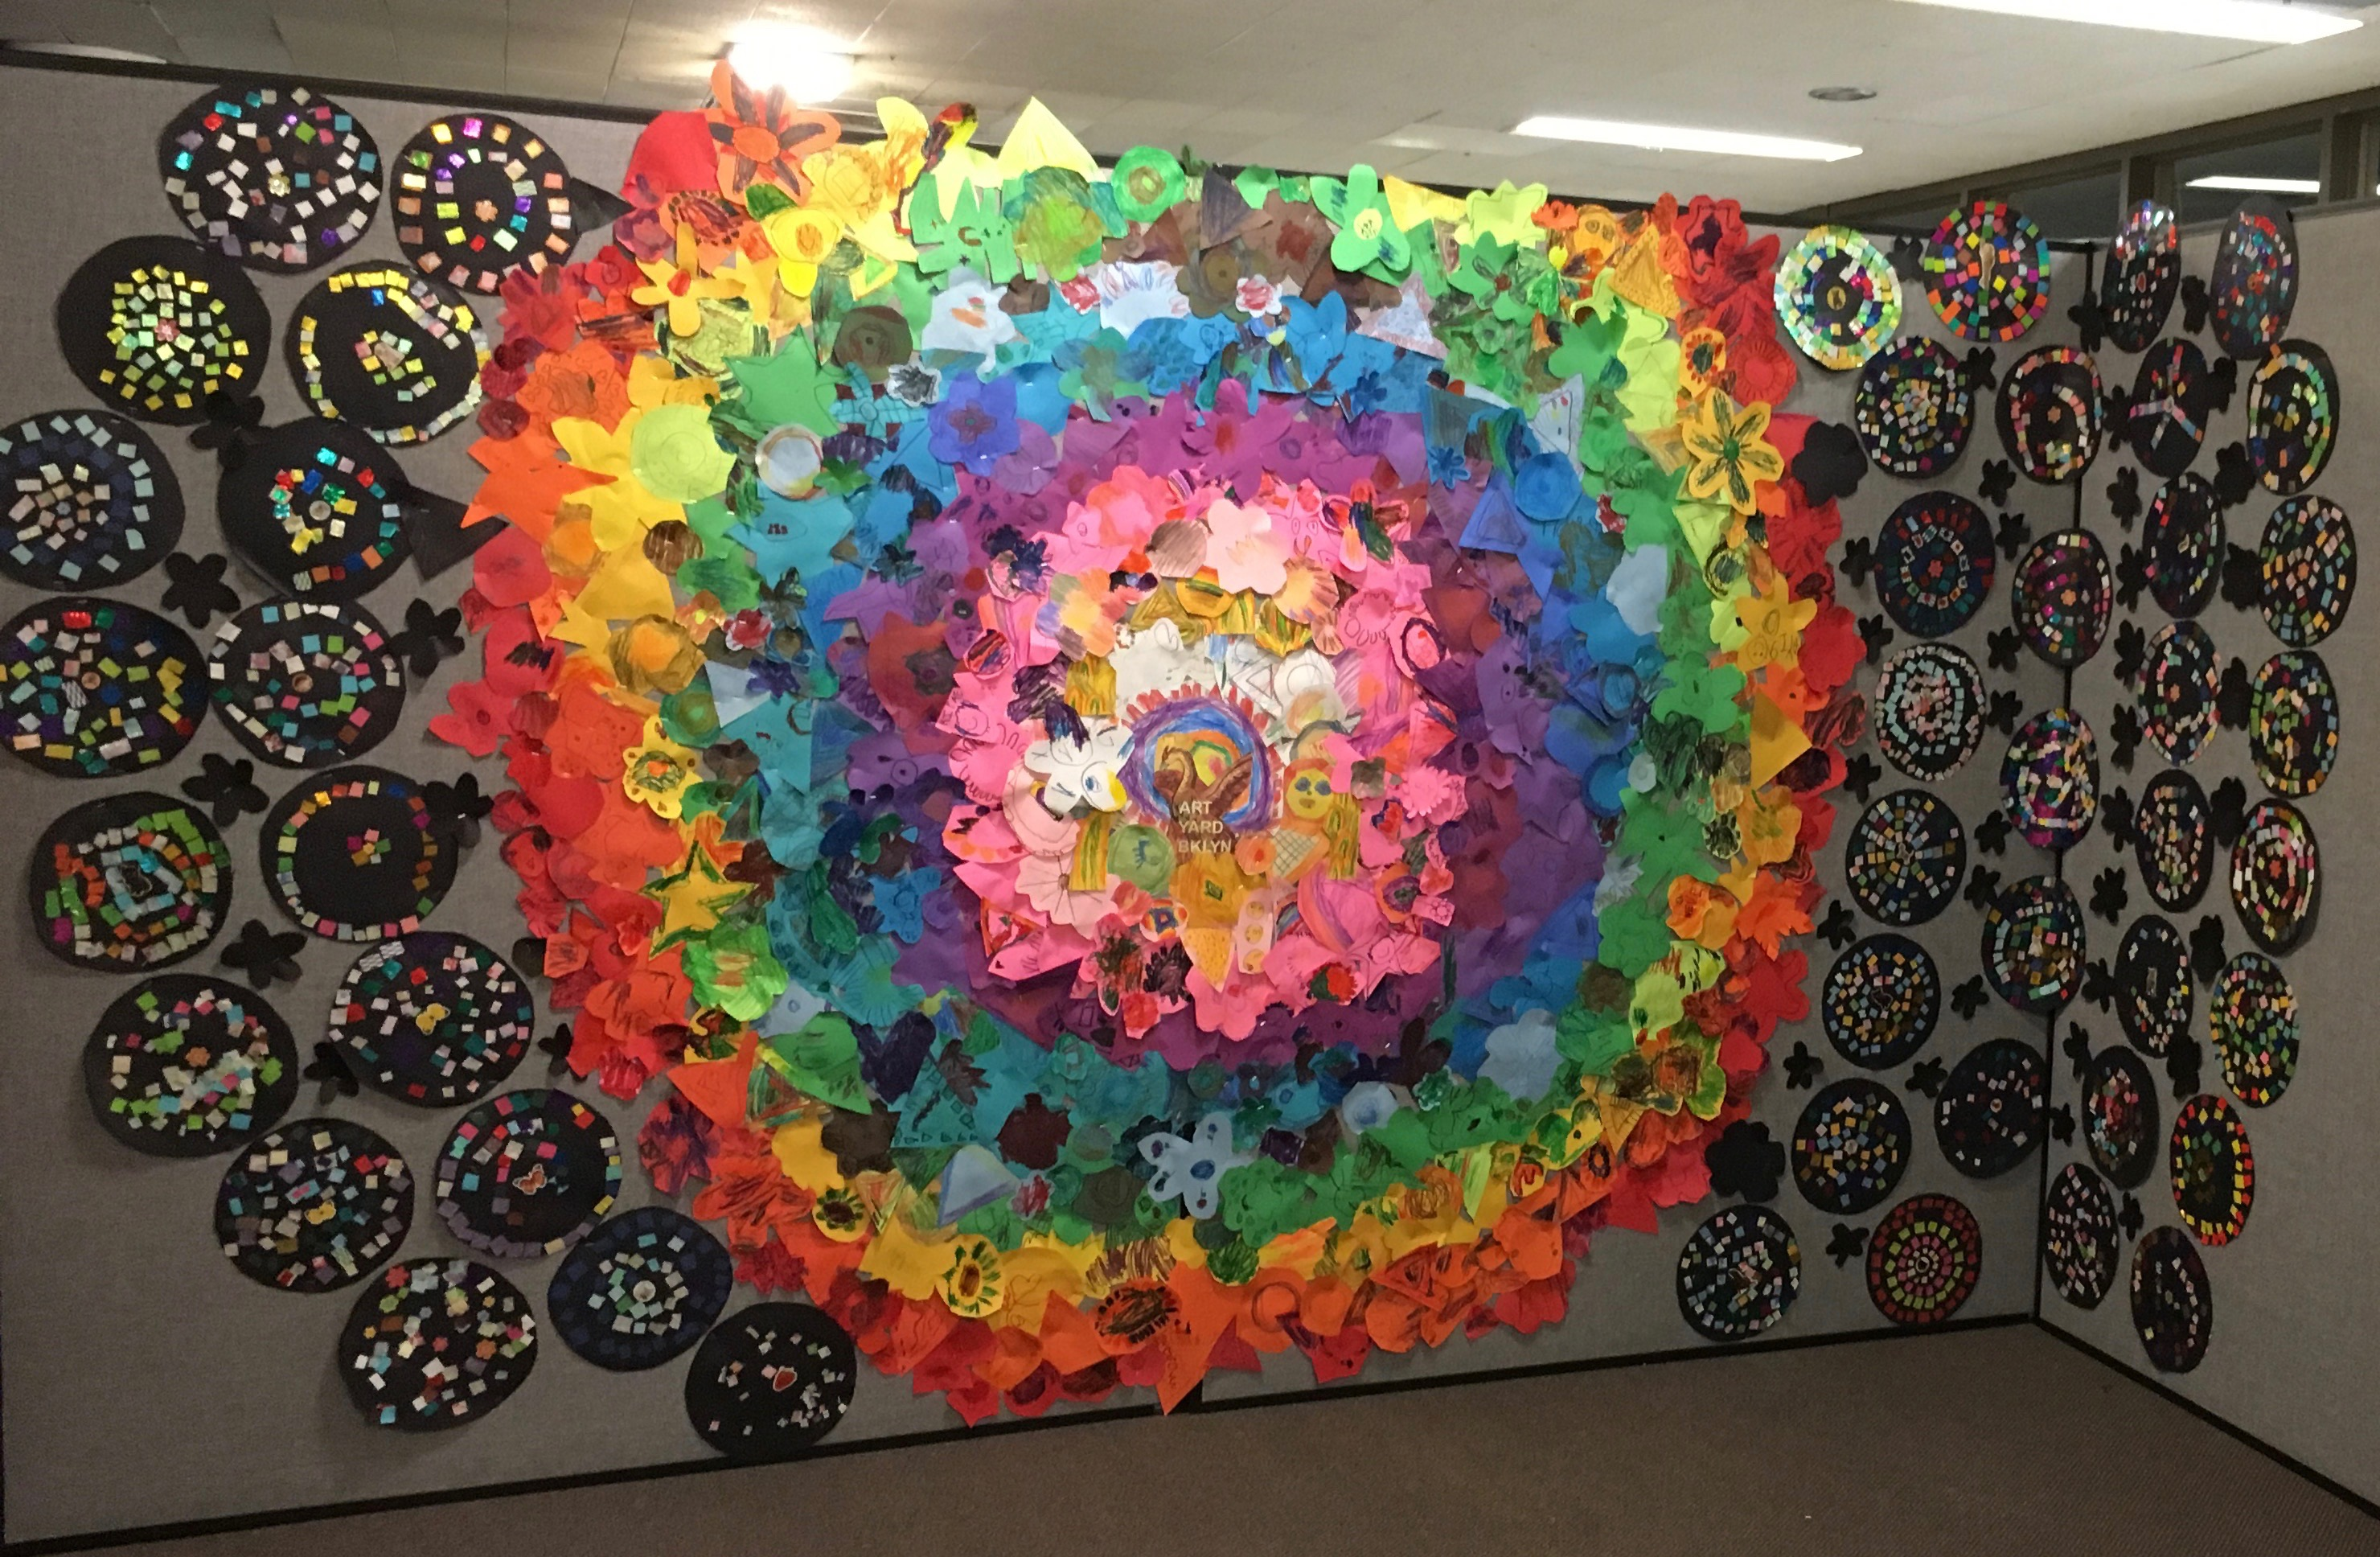 8 Mosaic mandalla installation